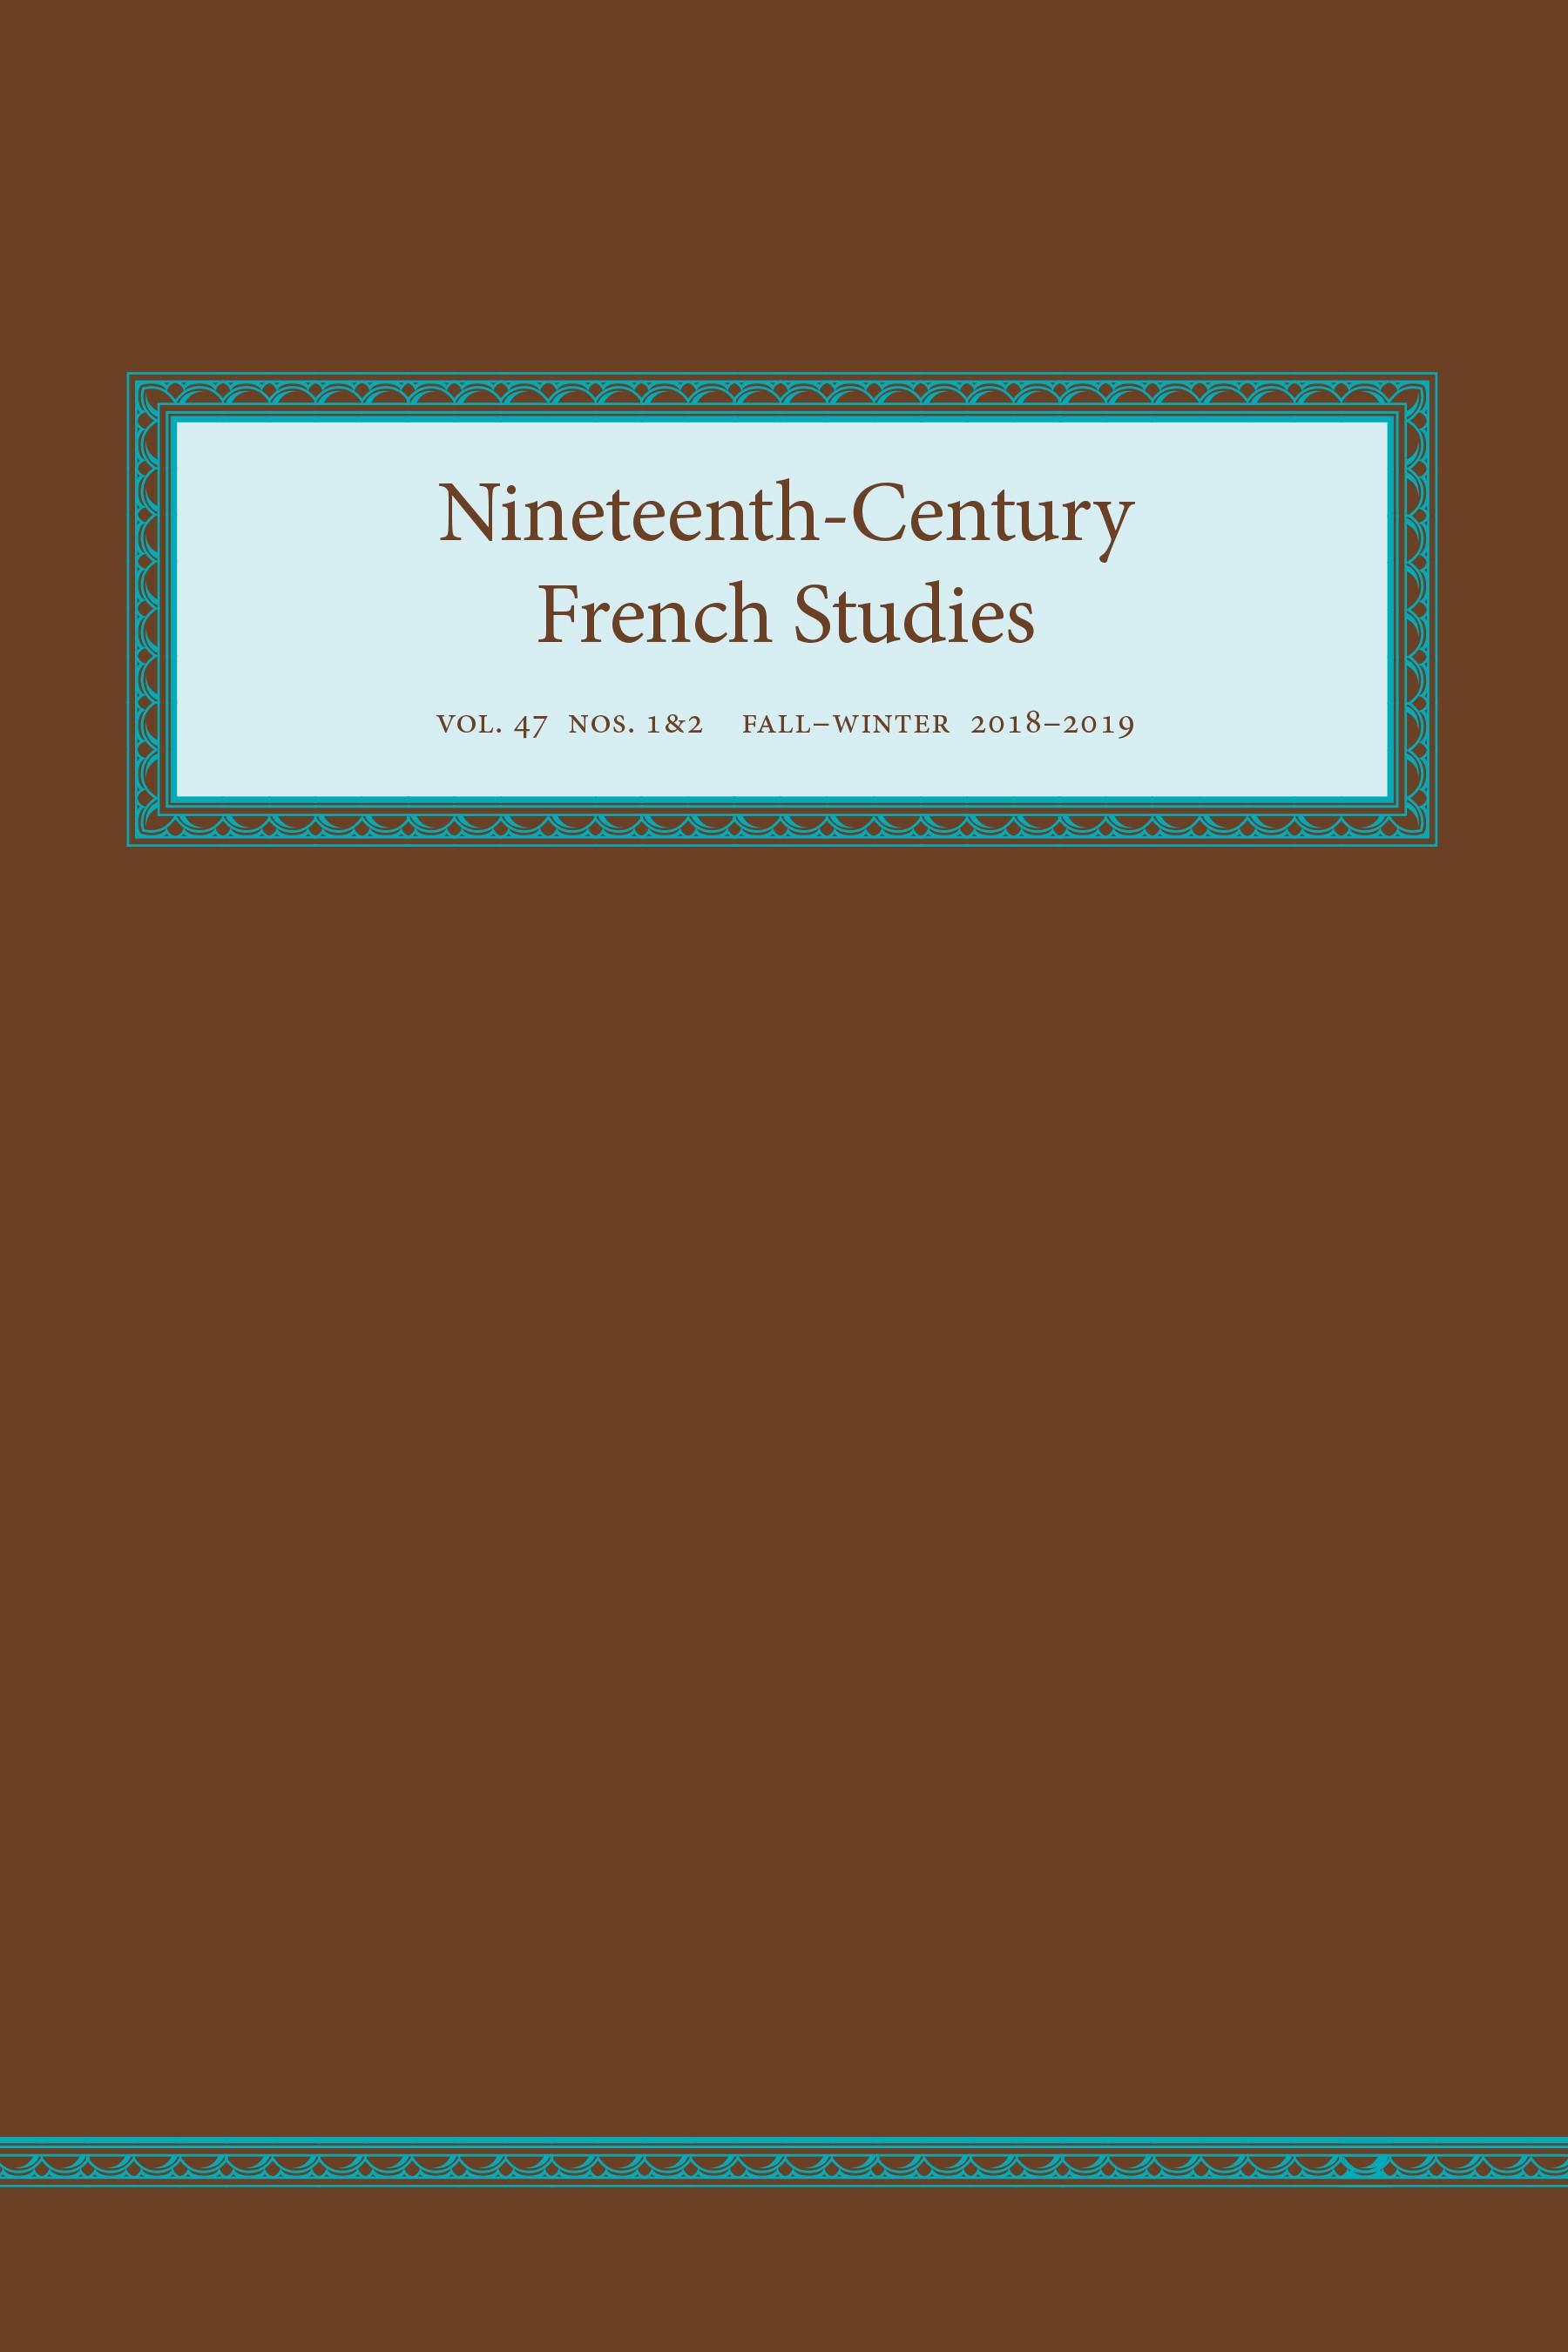 <em>Nineteenth-Century French Studies, </em>vol. 47, n° 1-2